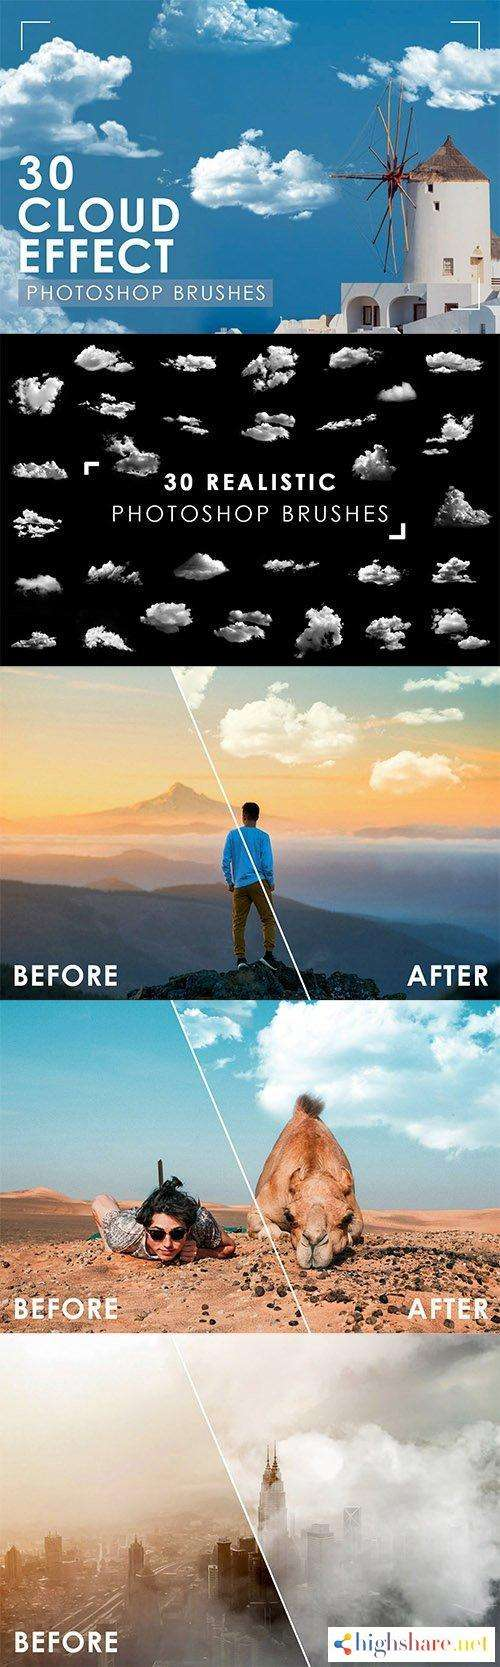 30 realistic cloud photoshop brushes 5f4a0e609245c - 30 Realistic Cloud Photoshop Brushes